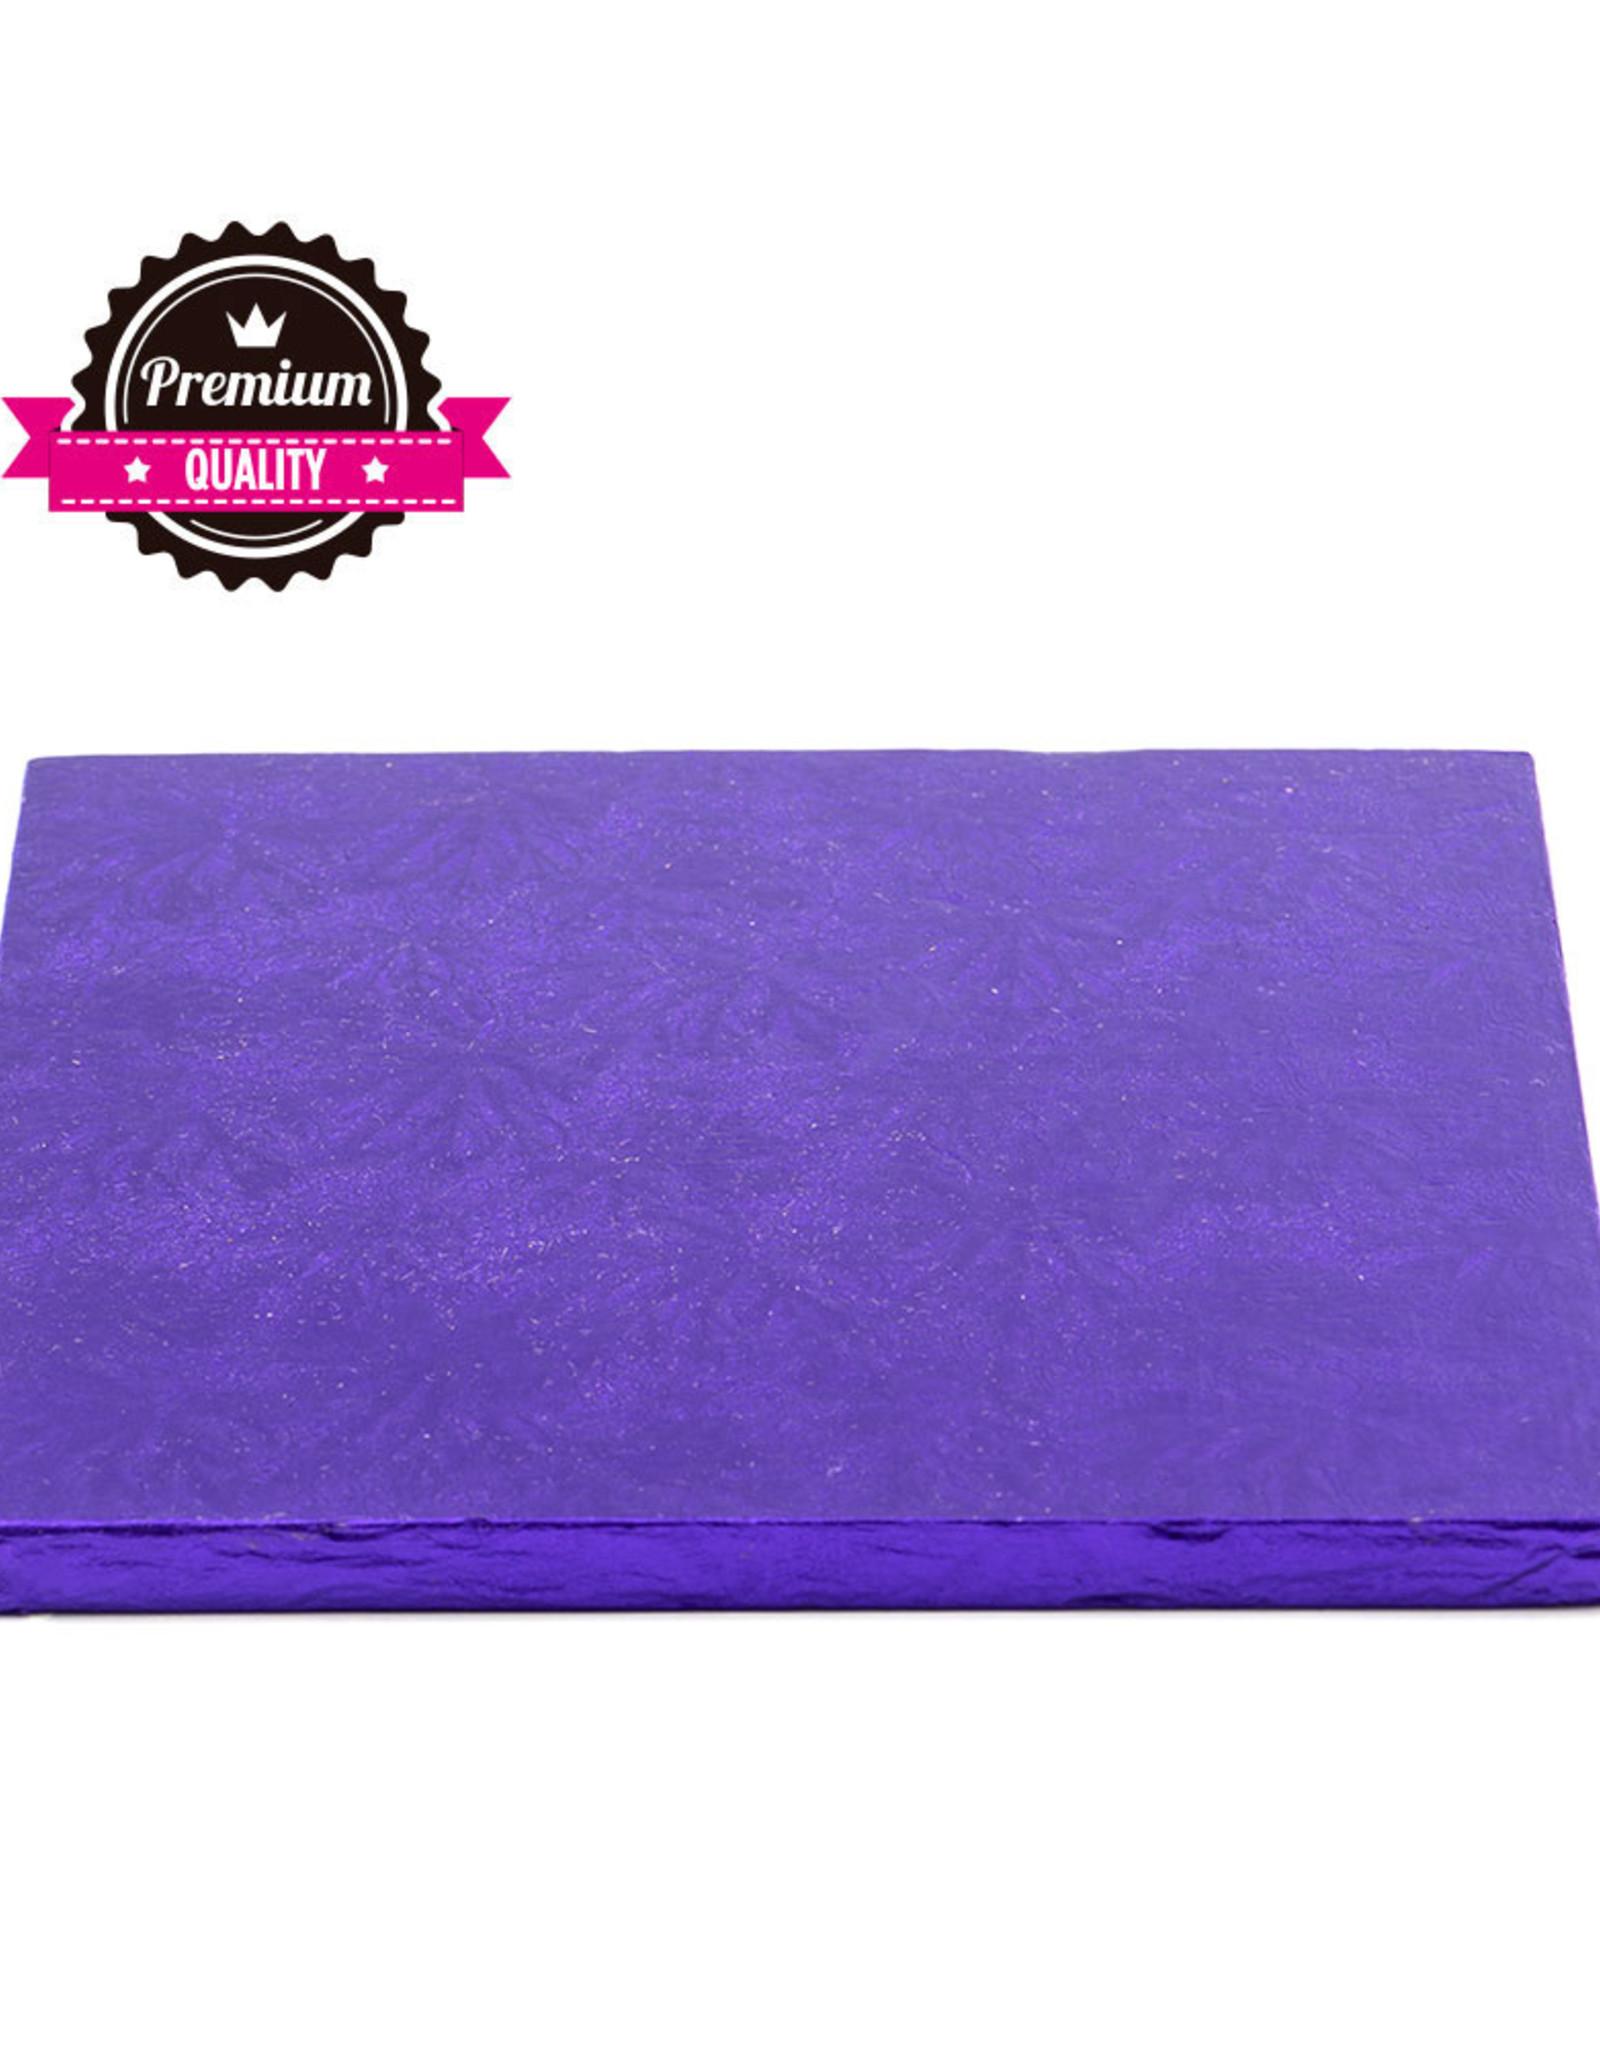 Cake Drum Vierkant 40cm Violet